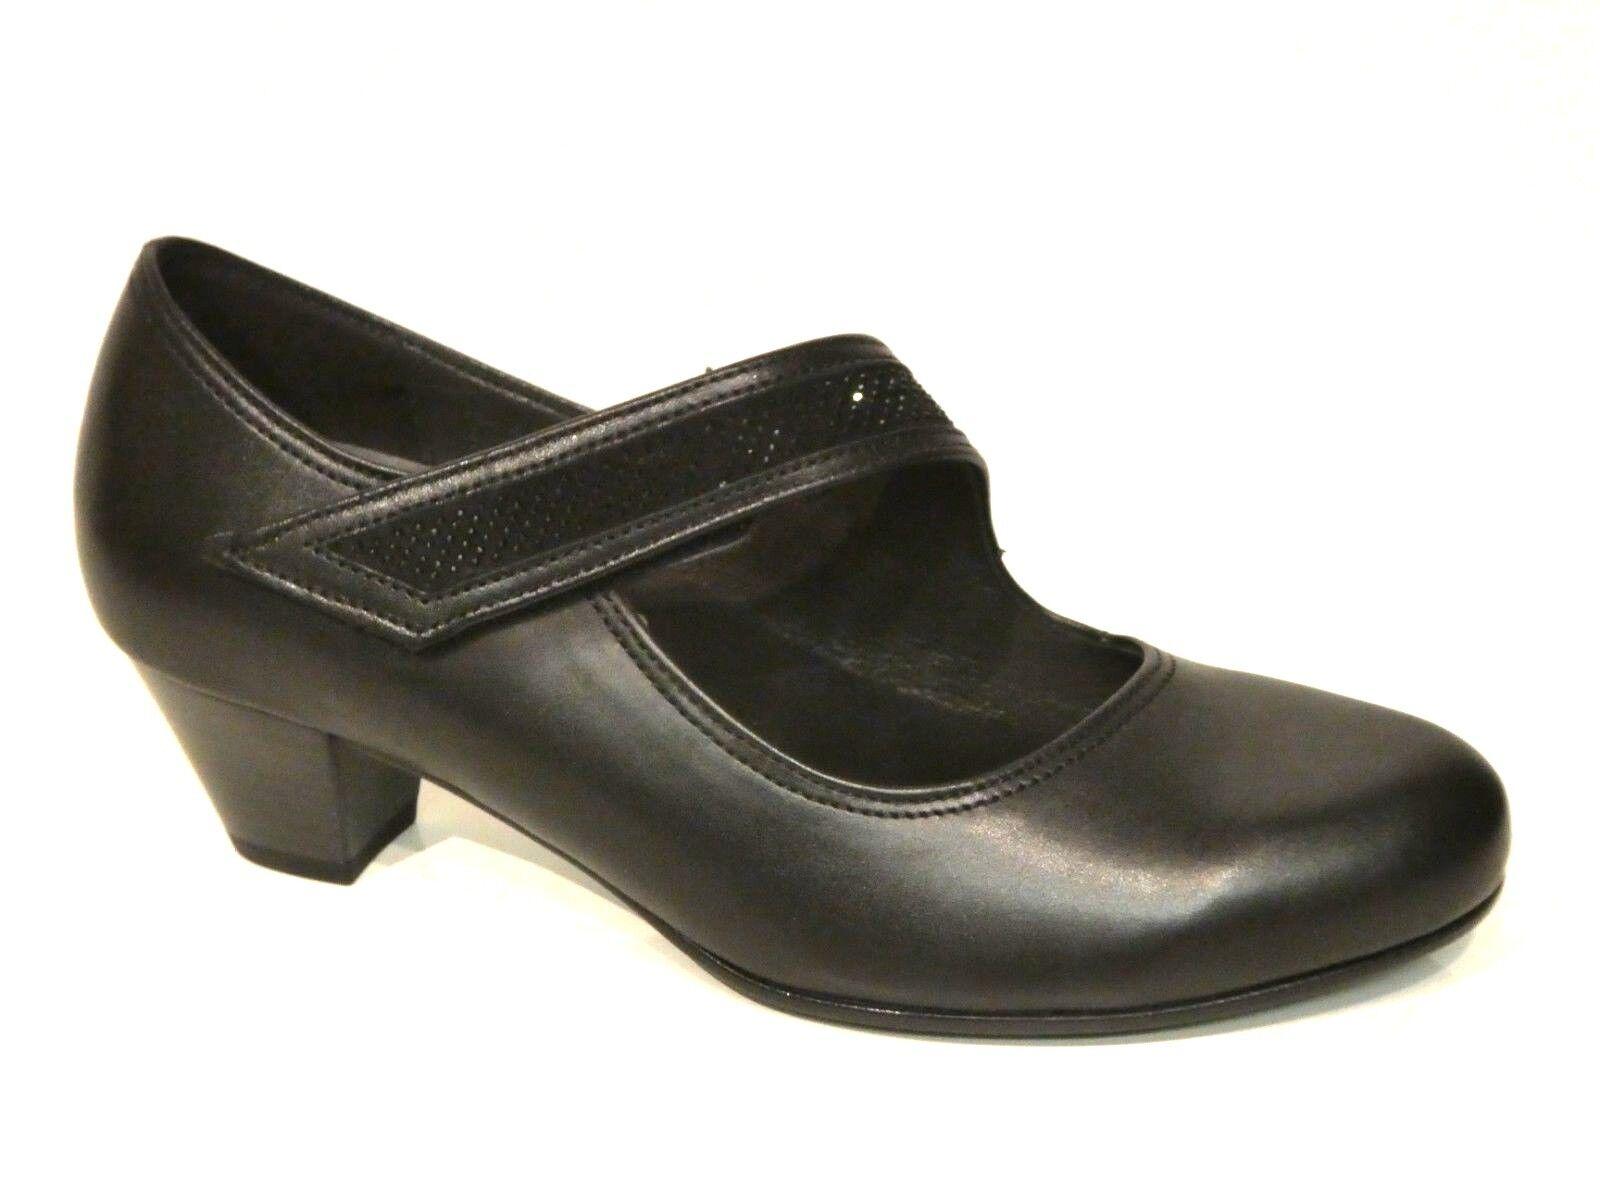 Pumps Damen Gabor Schuhe Pumps Schwarz Aus Leder Leder Durch